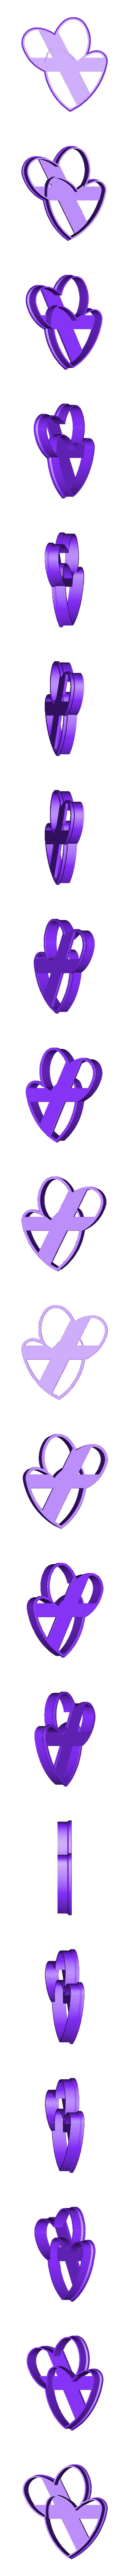 3D-01114 - DOUBLE HEART.stl Download free STL file Double heart cookie cutter • 3D printable design, 3DPrintersaur